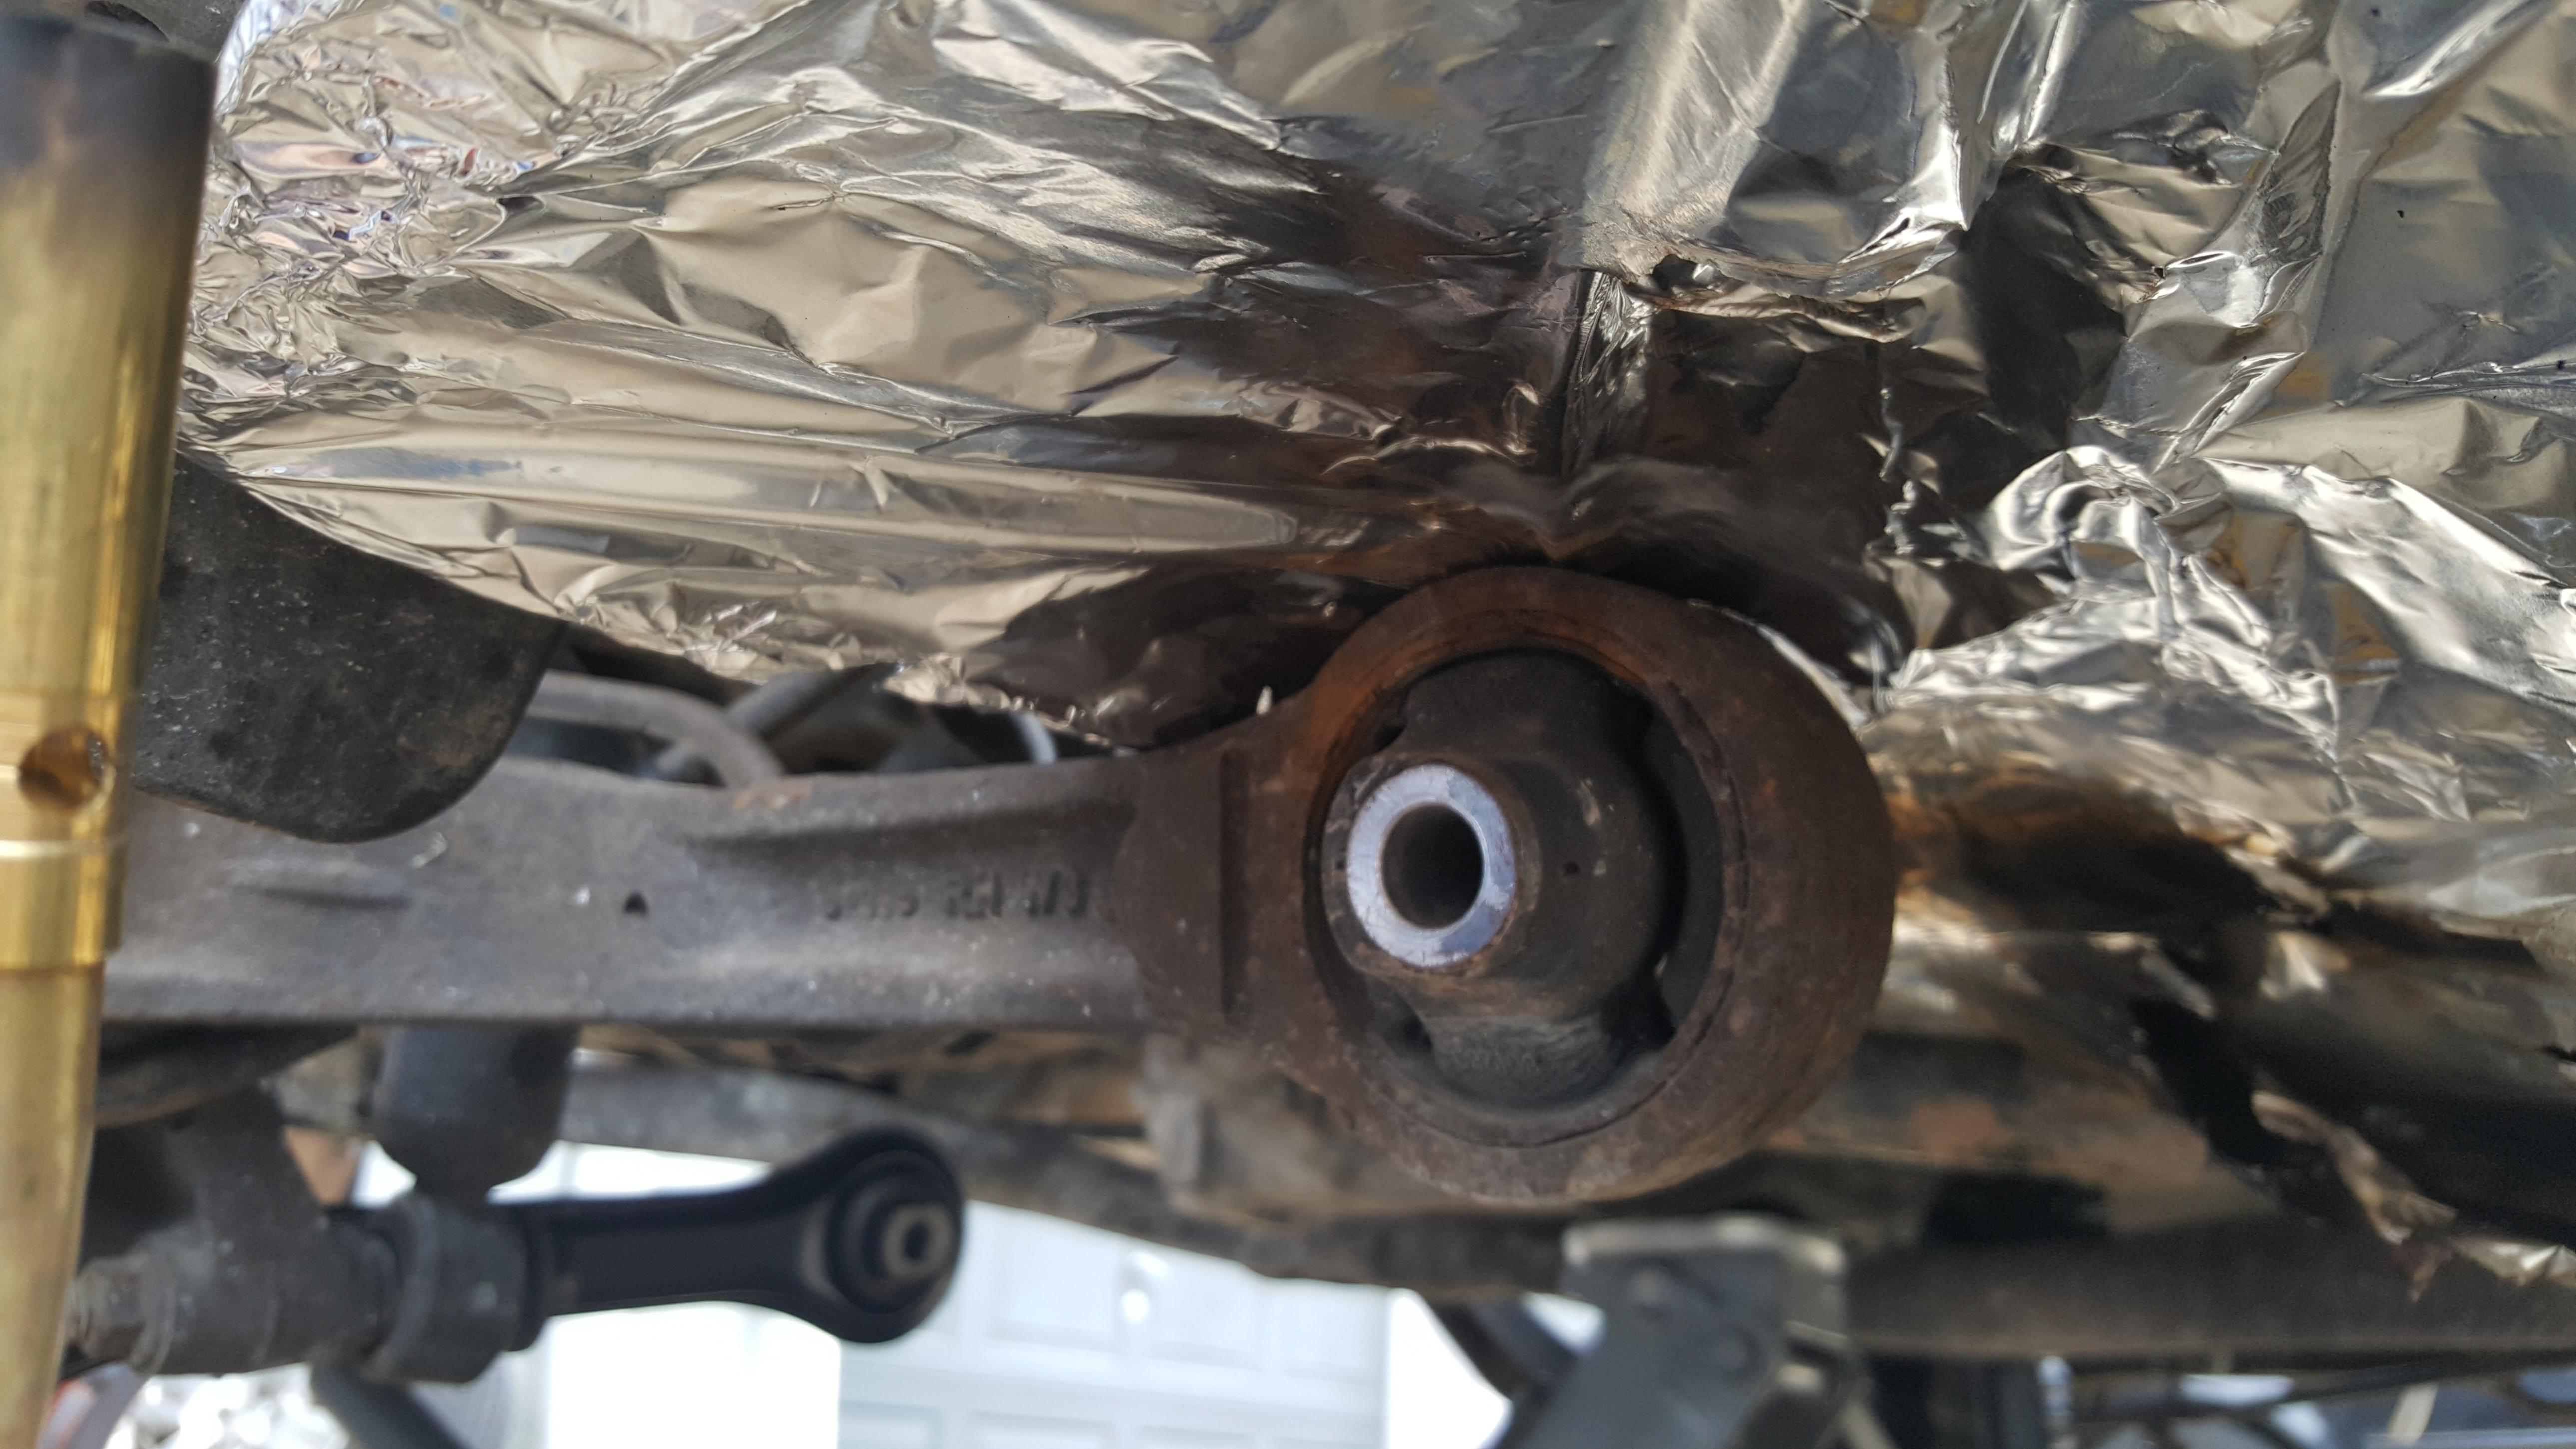 Trailing Arm Bushing Replacement Advice Needed Subaru